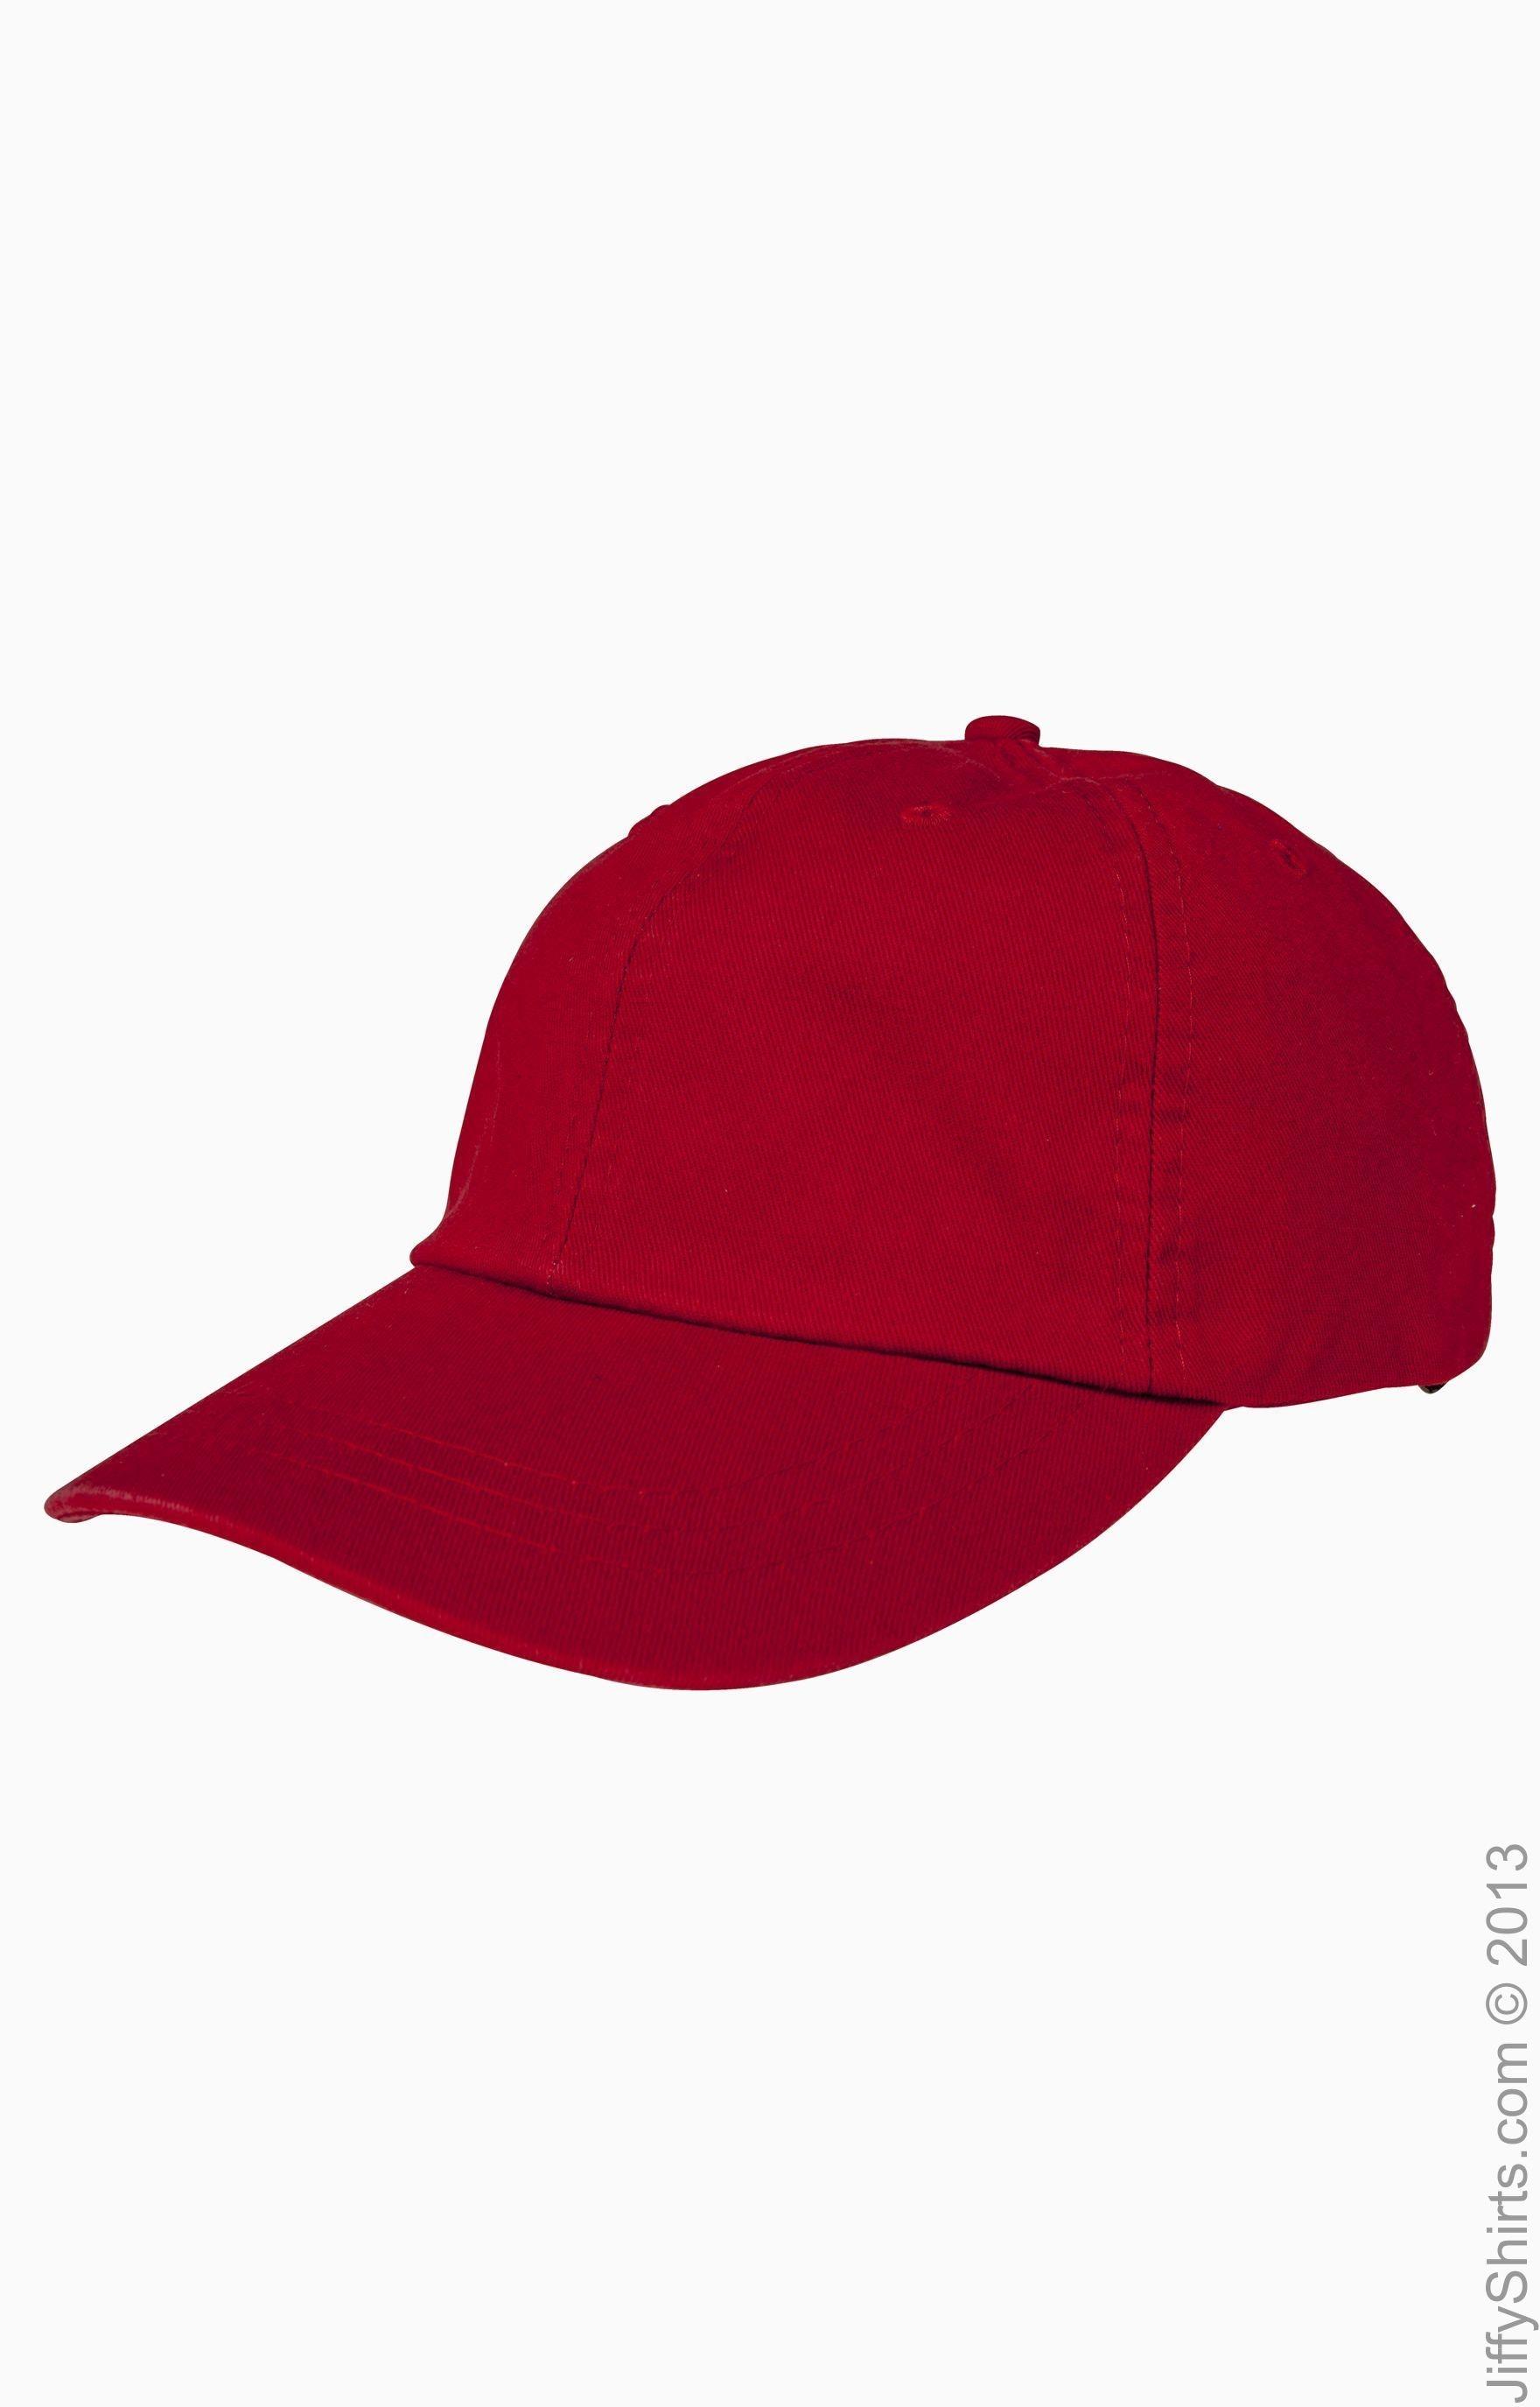 ADAMS LP104 Red